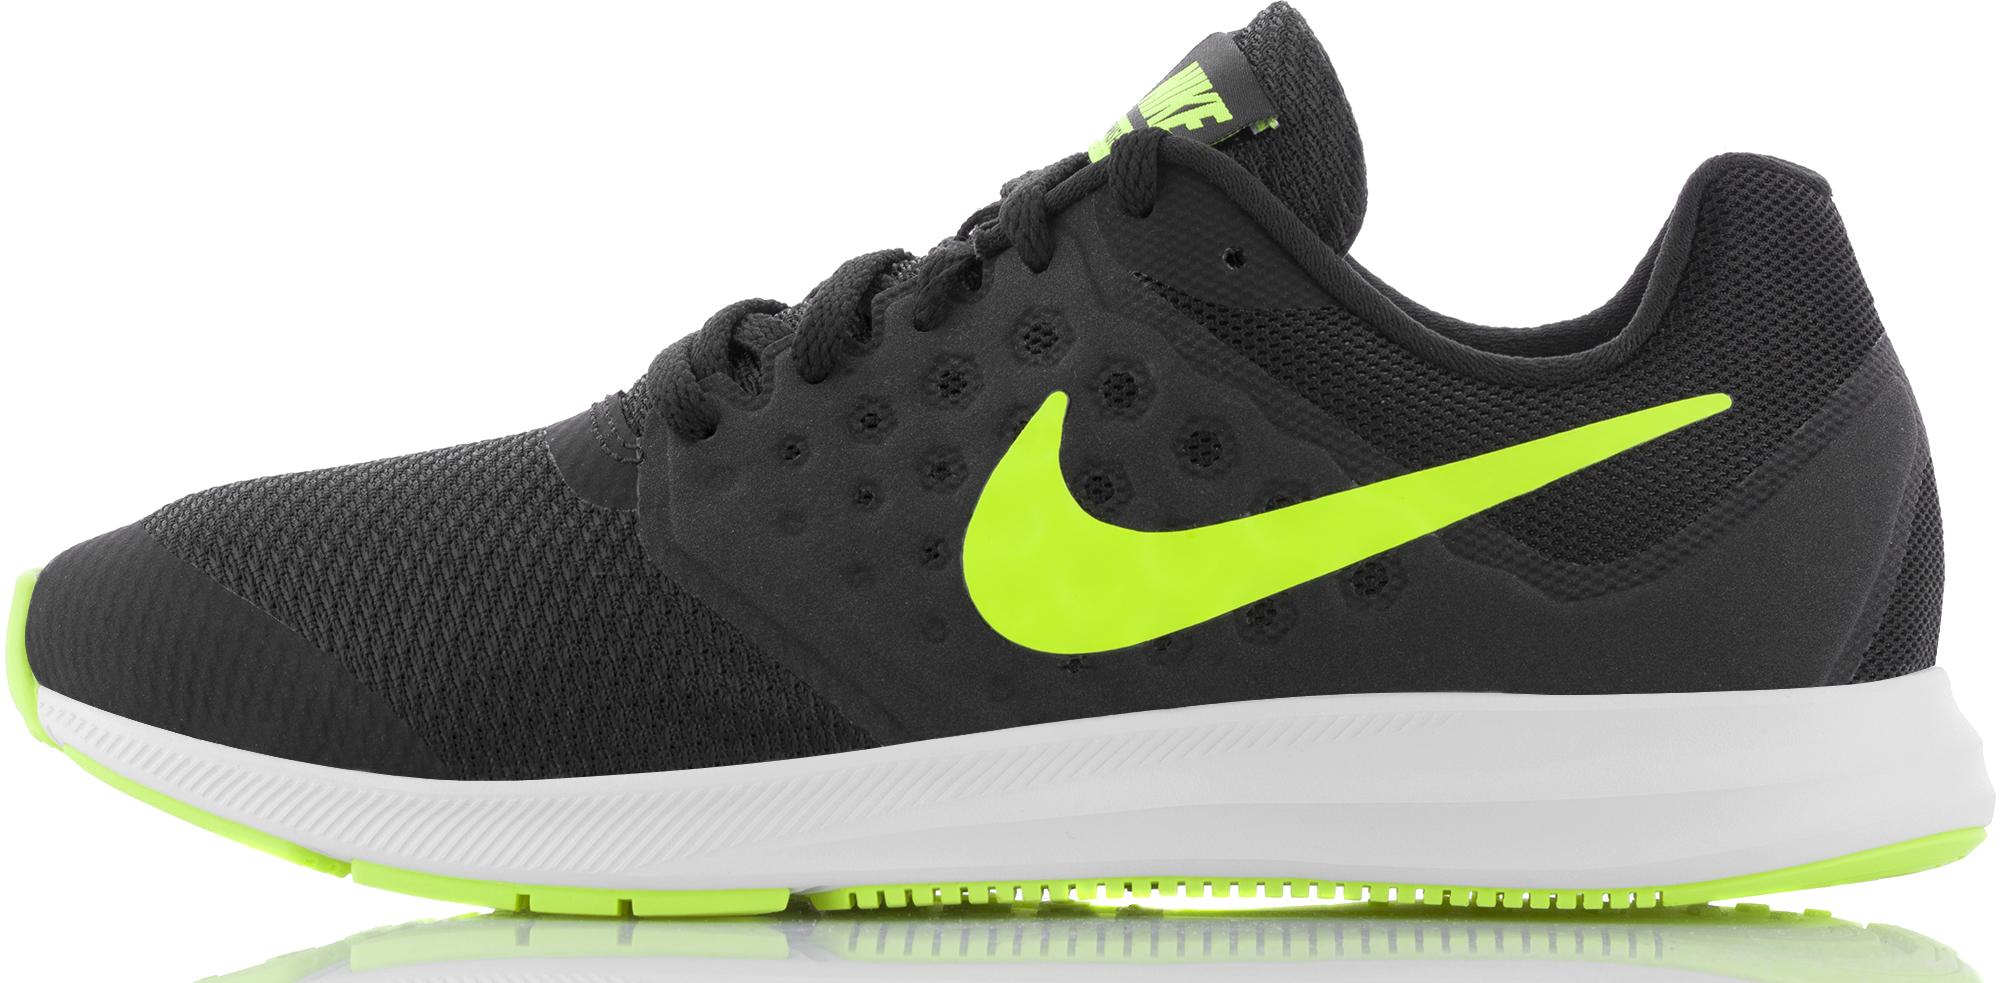 Nike Кроссовки для мальчиков Nike Downshifter 7 кроссовки для мальчиков сказка